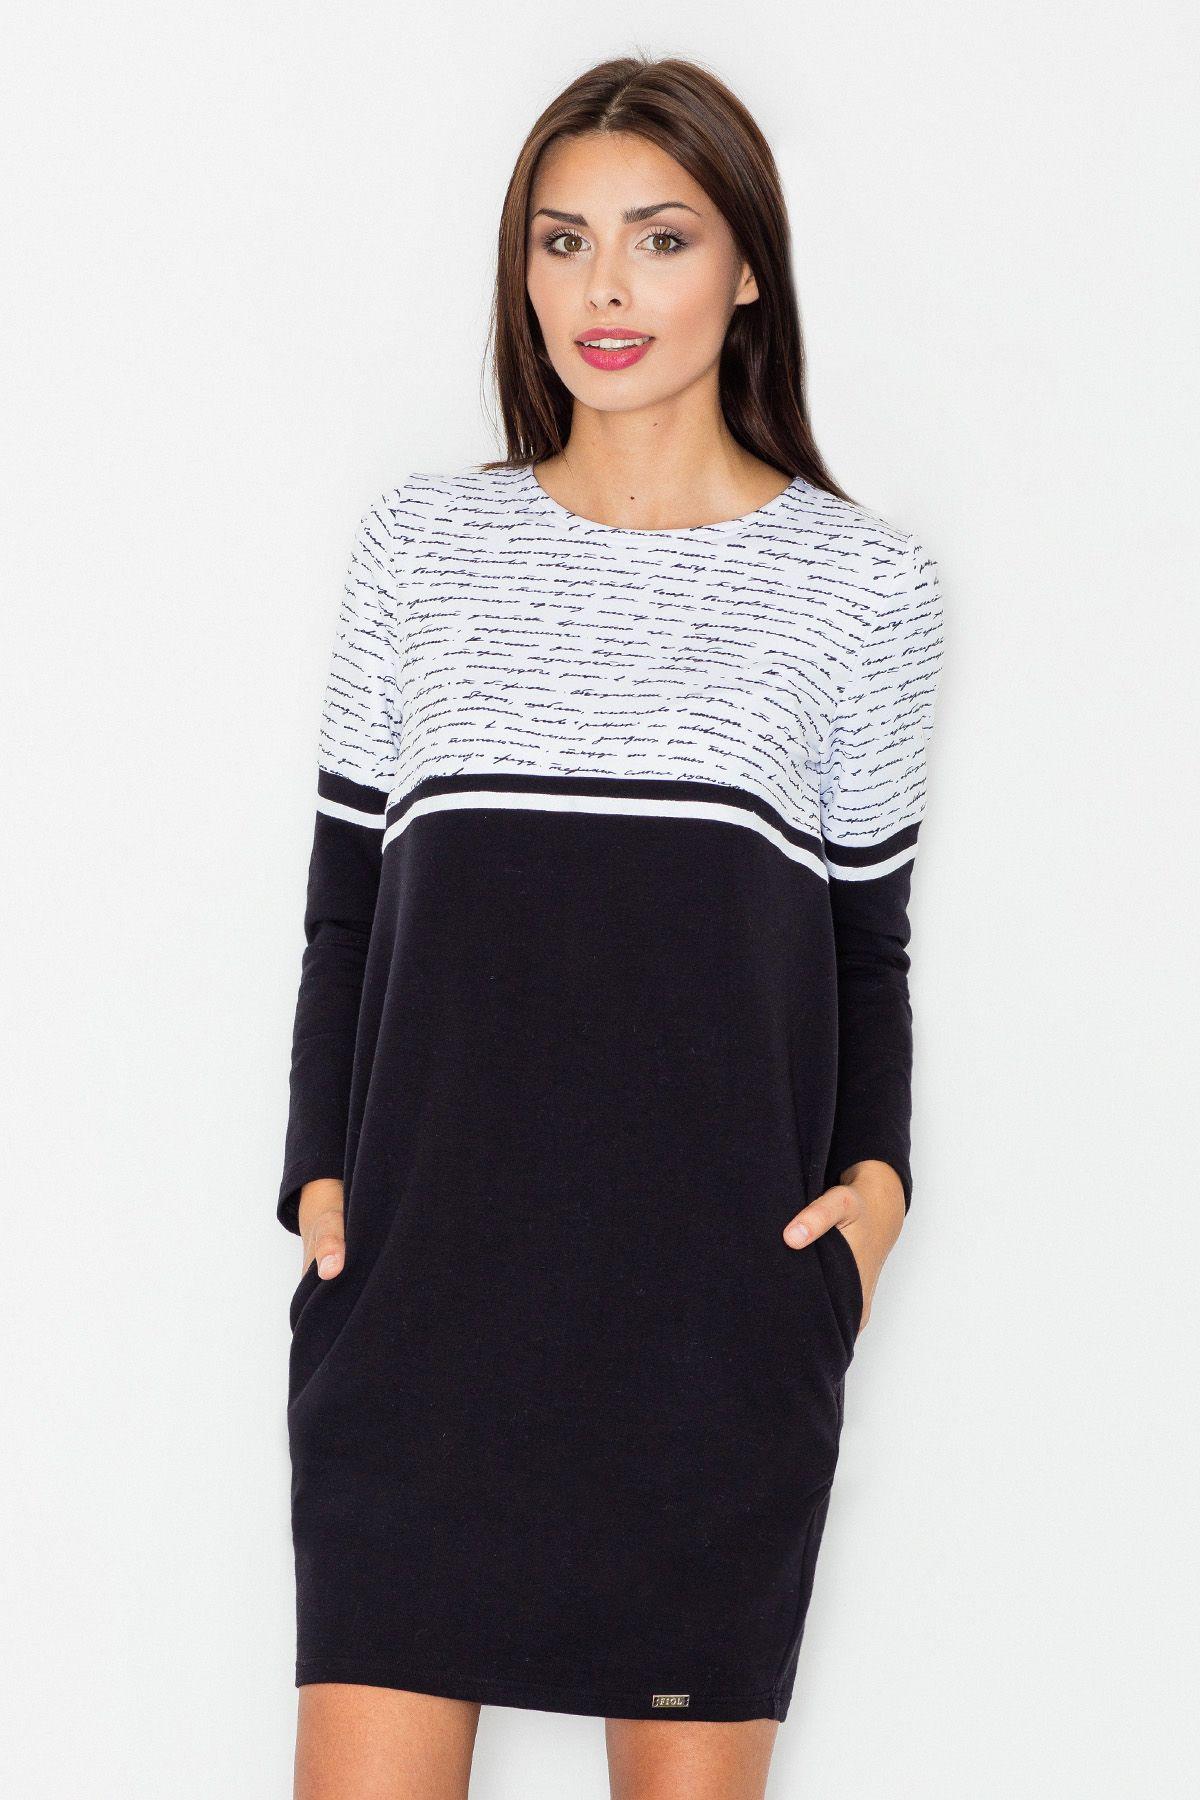 Black Casual Cotton Dress